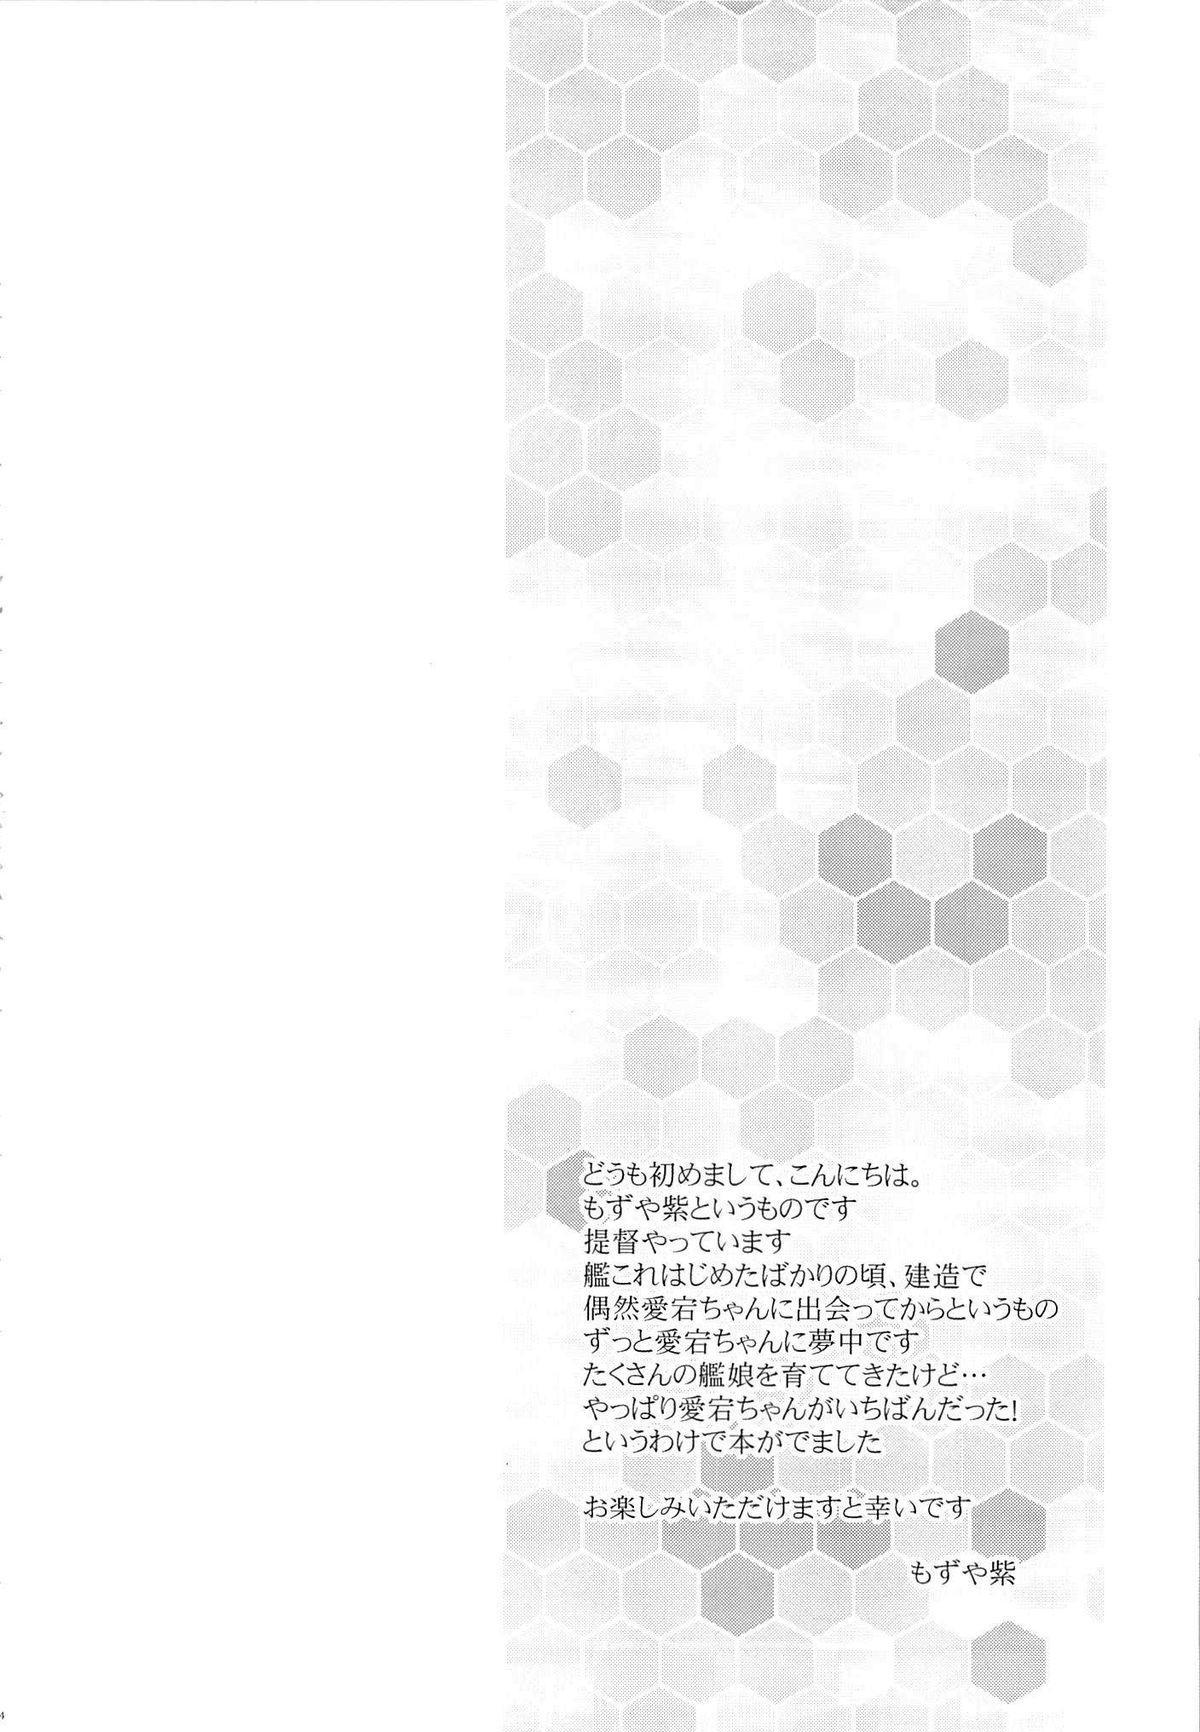 (Houraigekisen! Yo-i! 4Senme!) [MOZUCHICHI (Mozuya Murasaki)] Shimakaze...A, Atago-chan deshita ka...   Shimakaze... ah, Atago-chan, Were You... (Kantai Collection) [English] {doujin-moe.us} 2